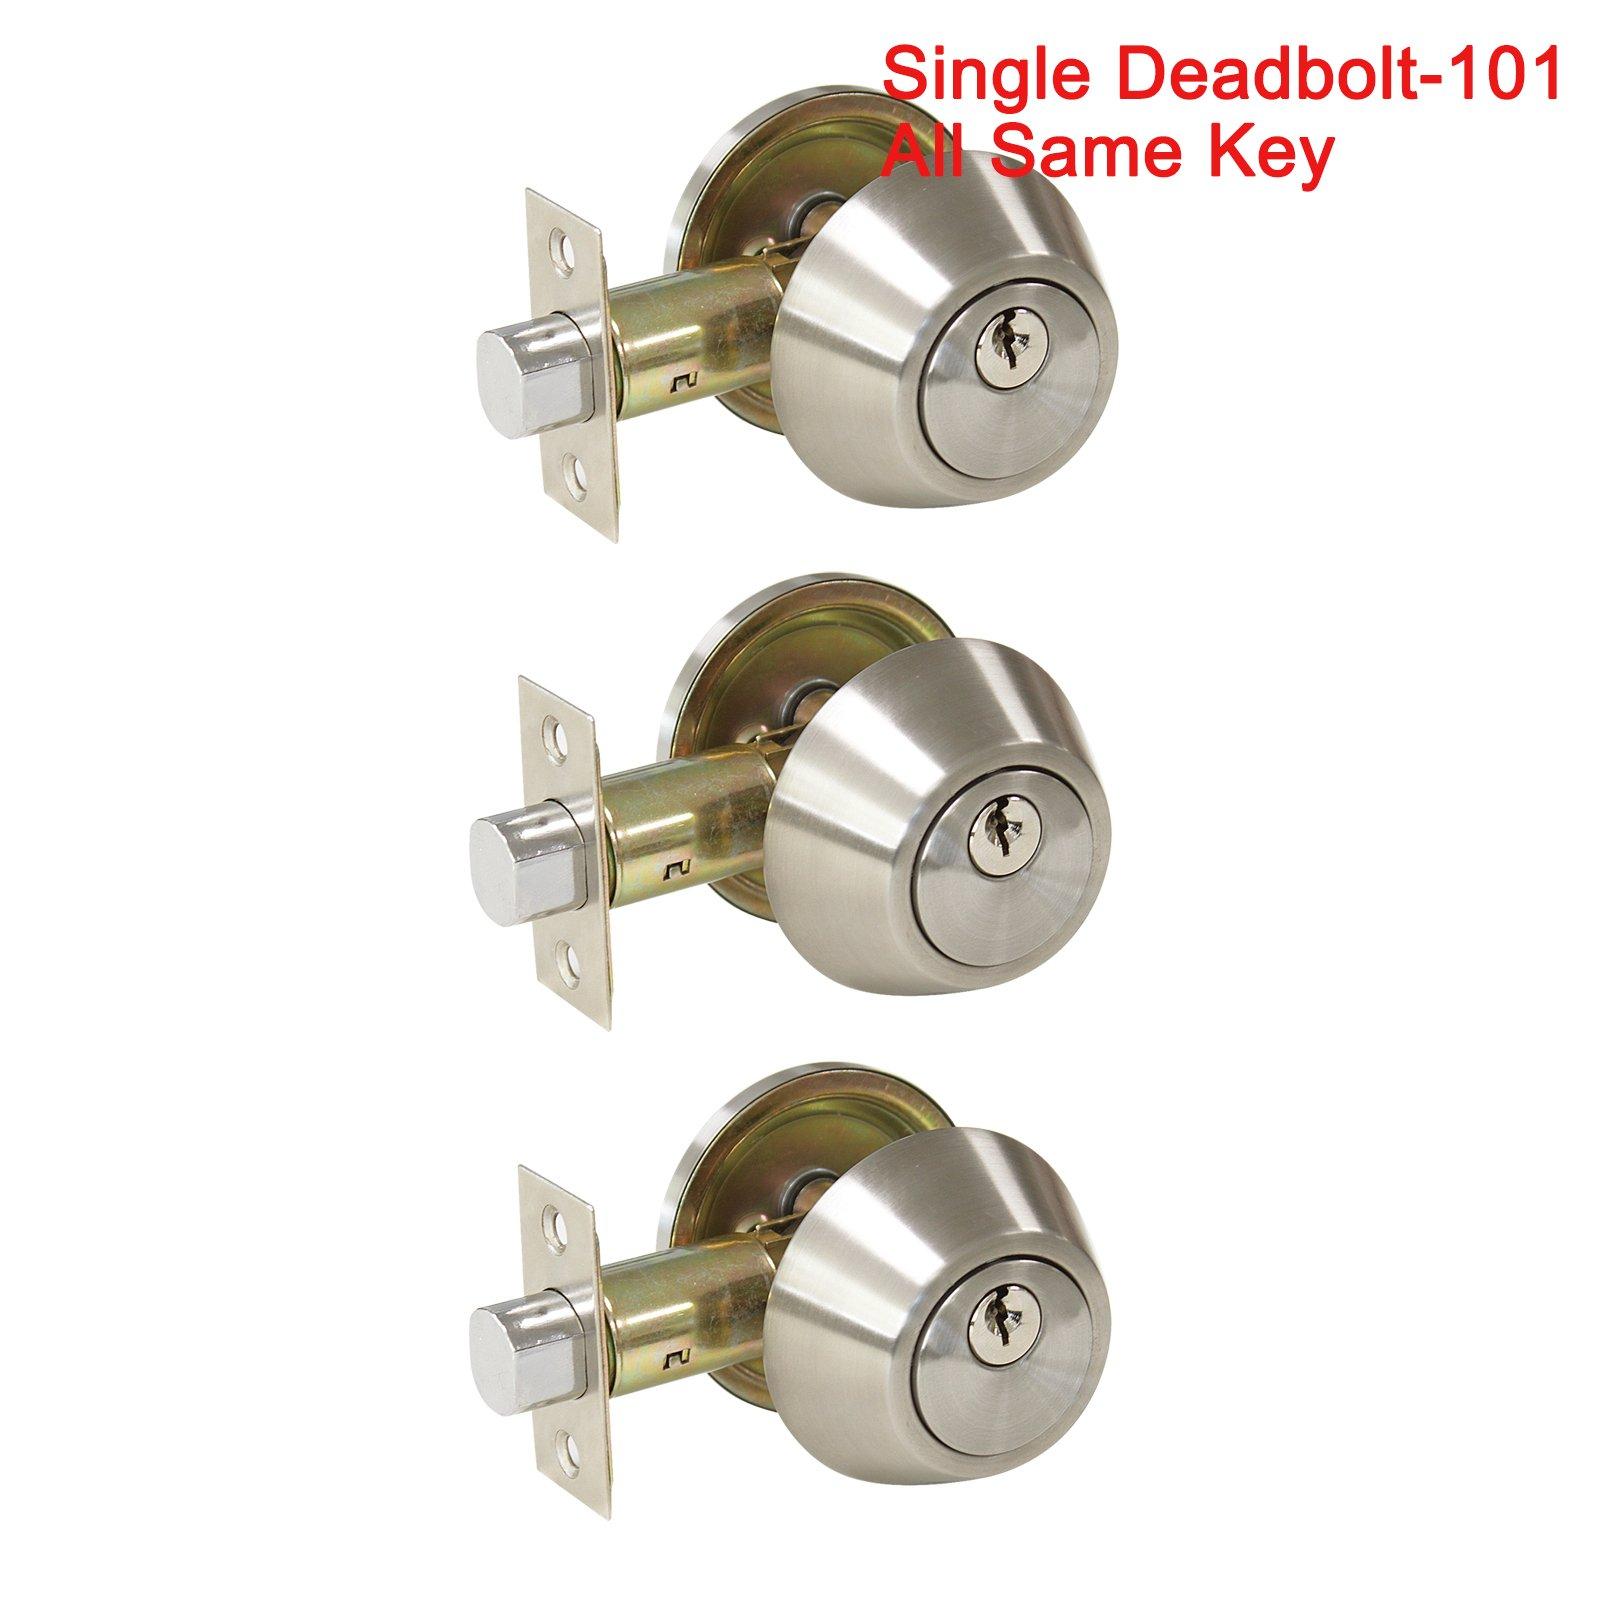 3 Pack Probrico Interior Bedroom Single Cylinder Deadbolt One Keyway Keyed Alike Same Key Safety Bolt Door Lock Lockset in Satin Nickel-Single Deadbolt-101 by Probrico (Image #7)